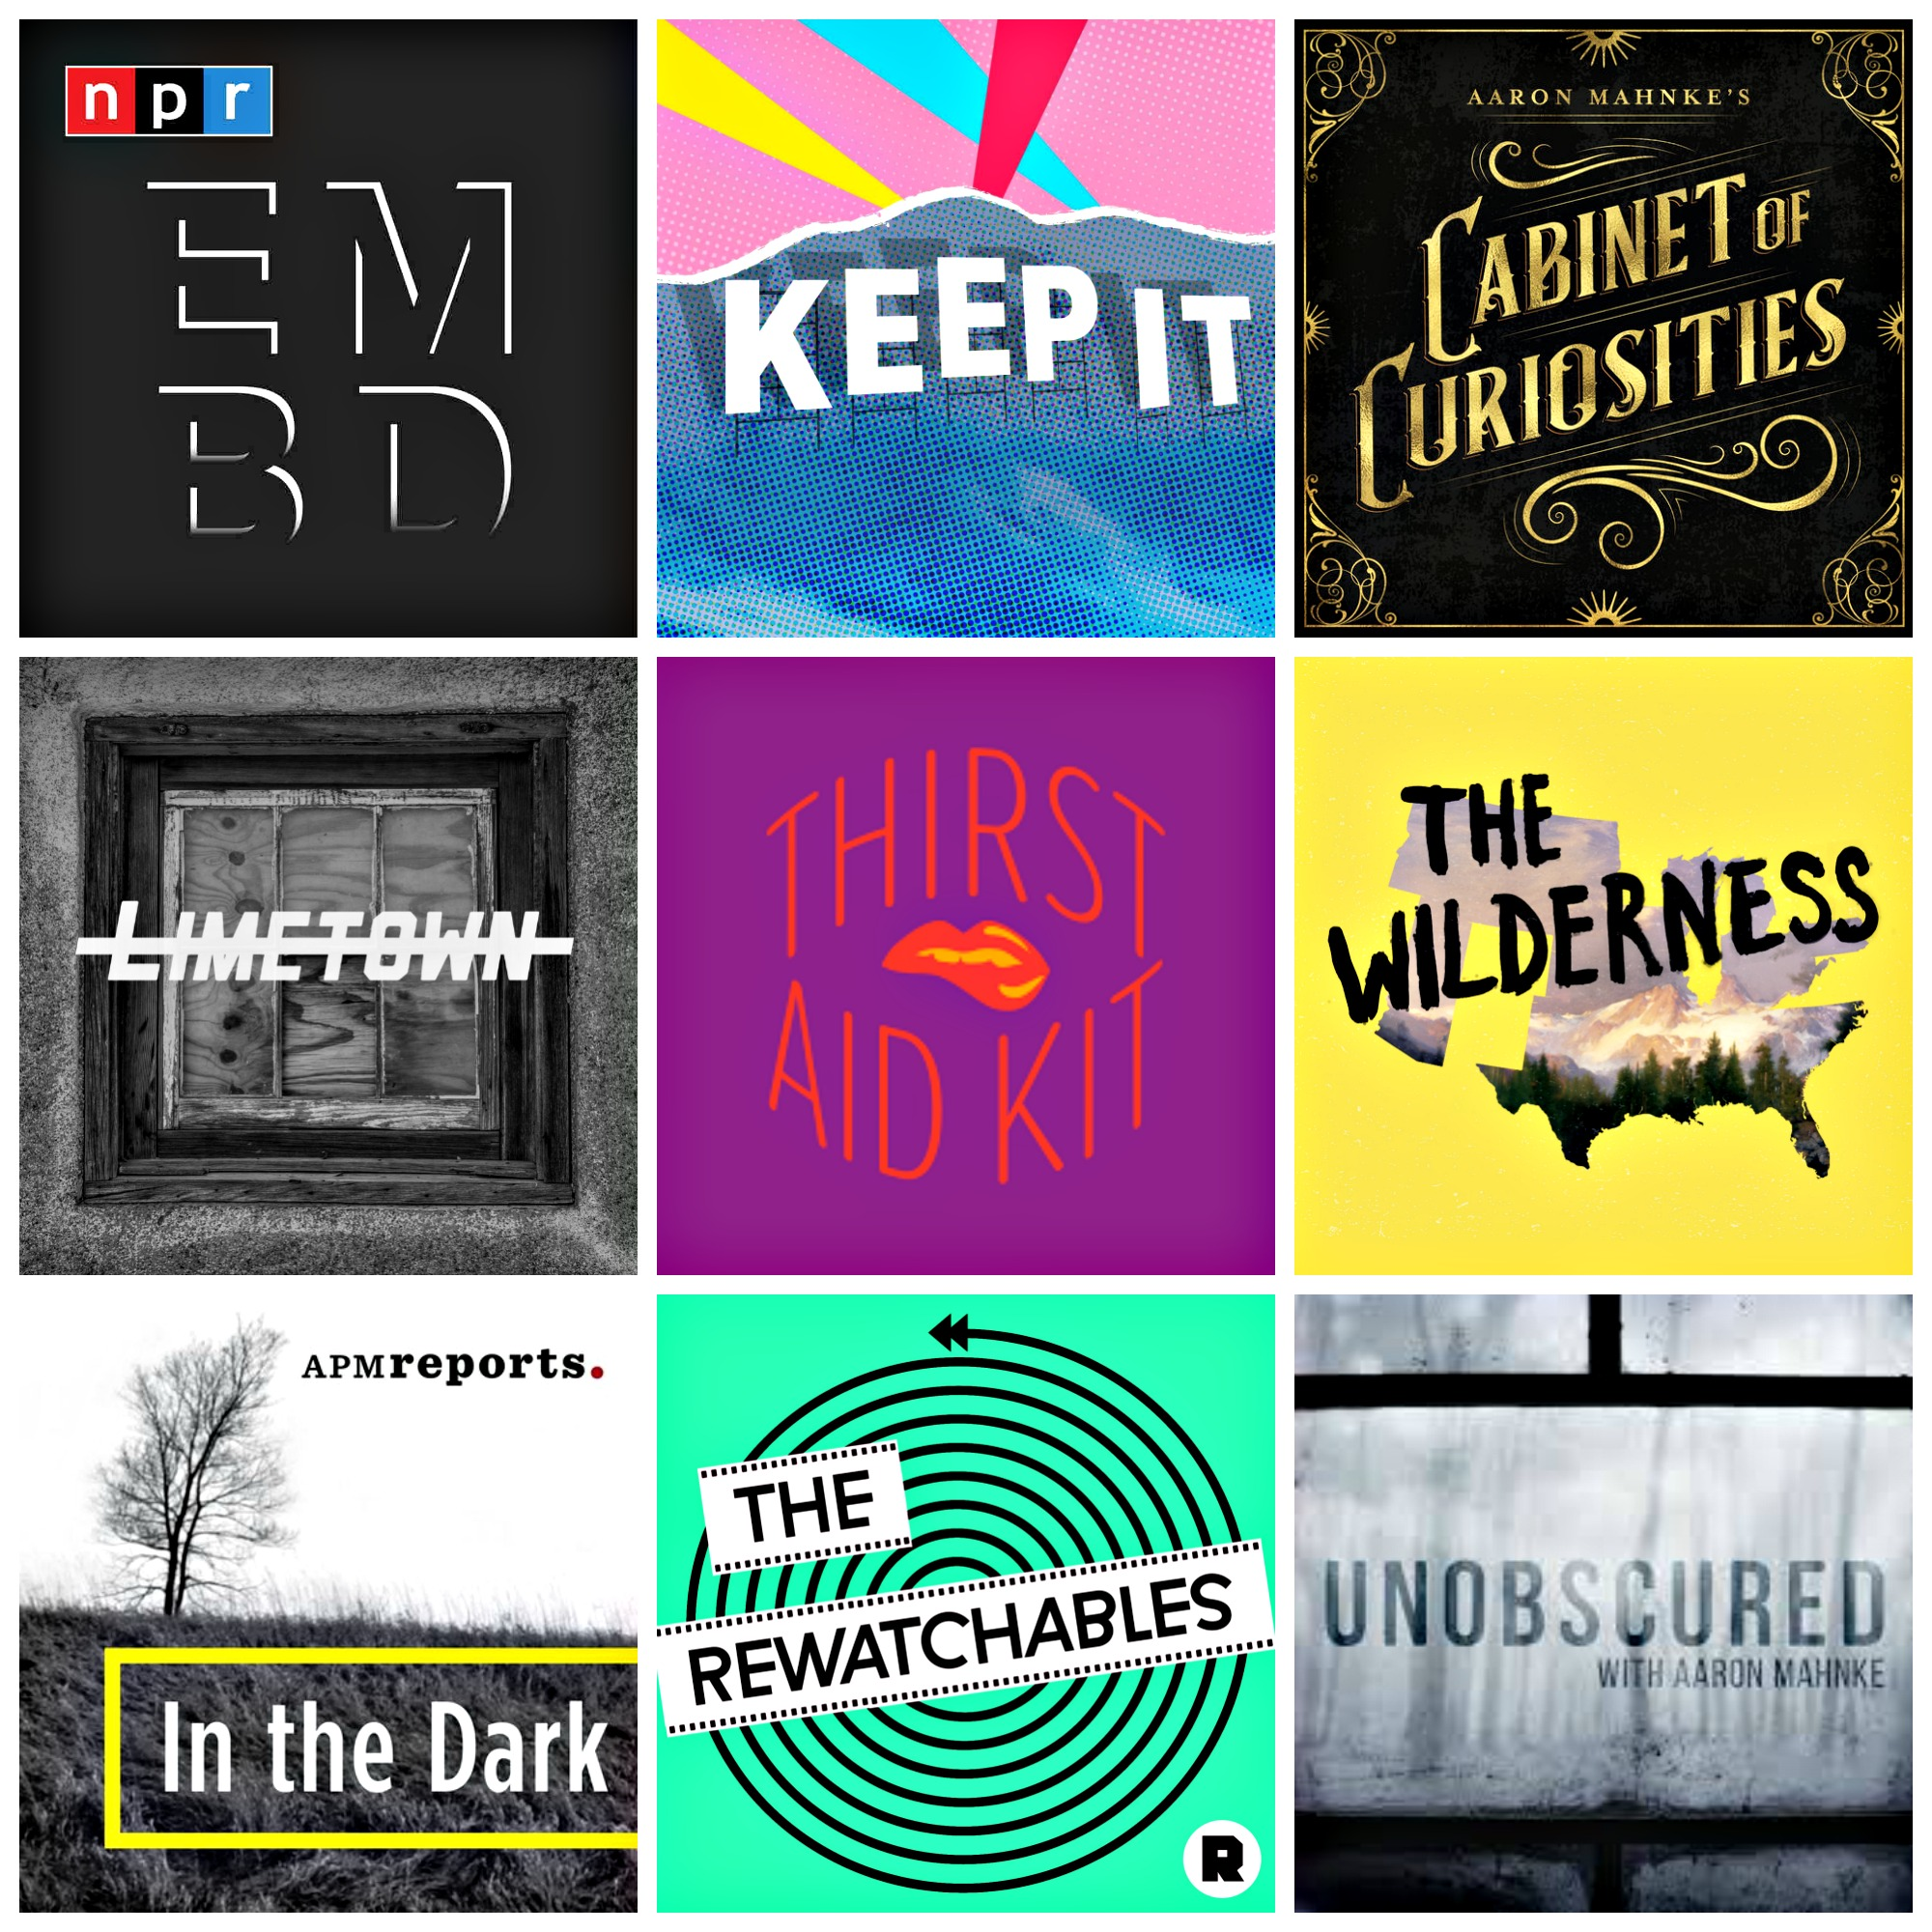 My-Favorite-Podcasts-2018.jpg